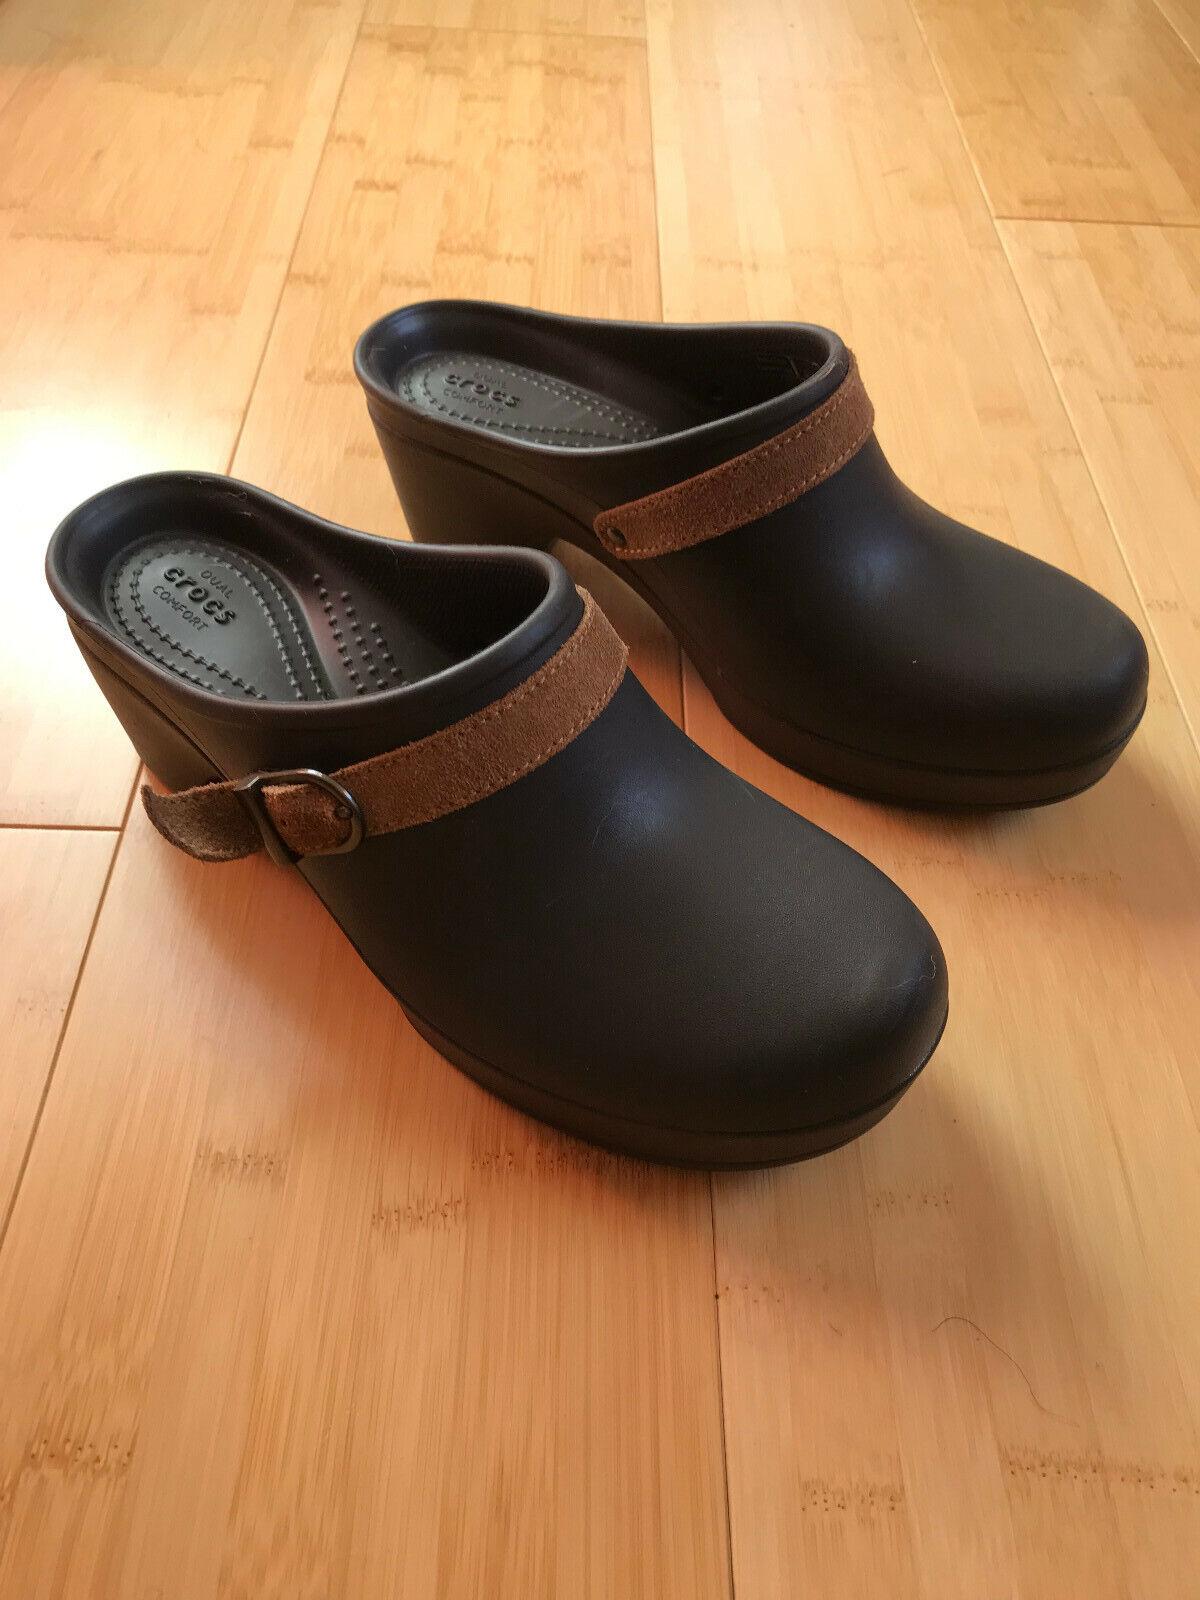 Crocs Womens Sarah Dual Comfort Clogs Size 7 Brown Slip On Mule w/ Buckle Strap